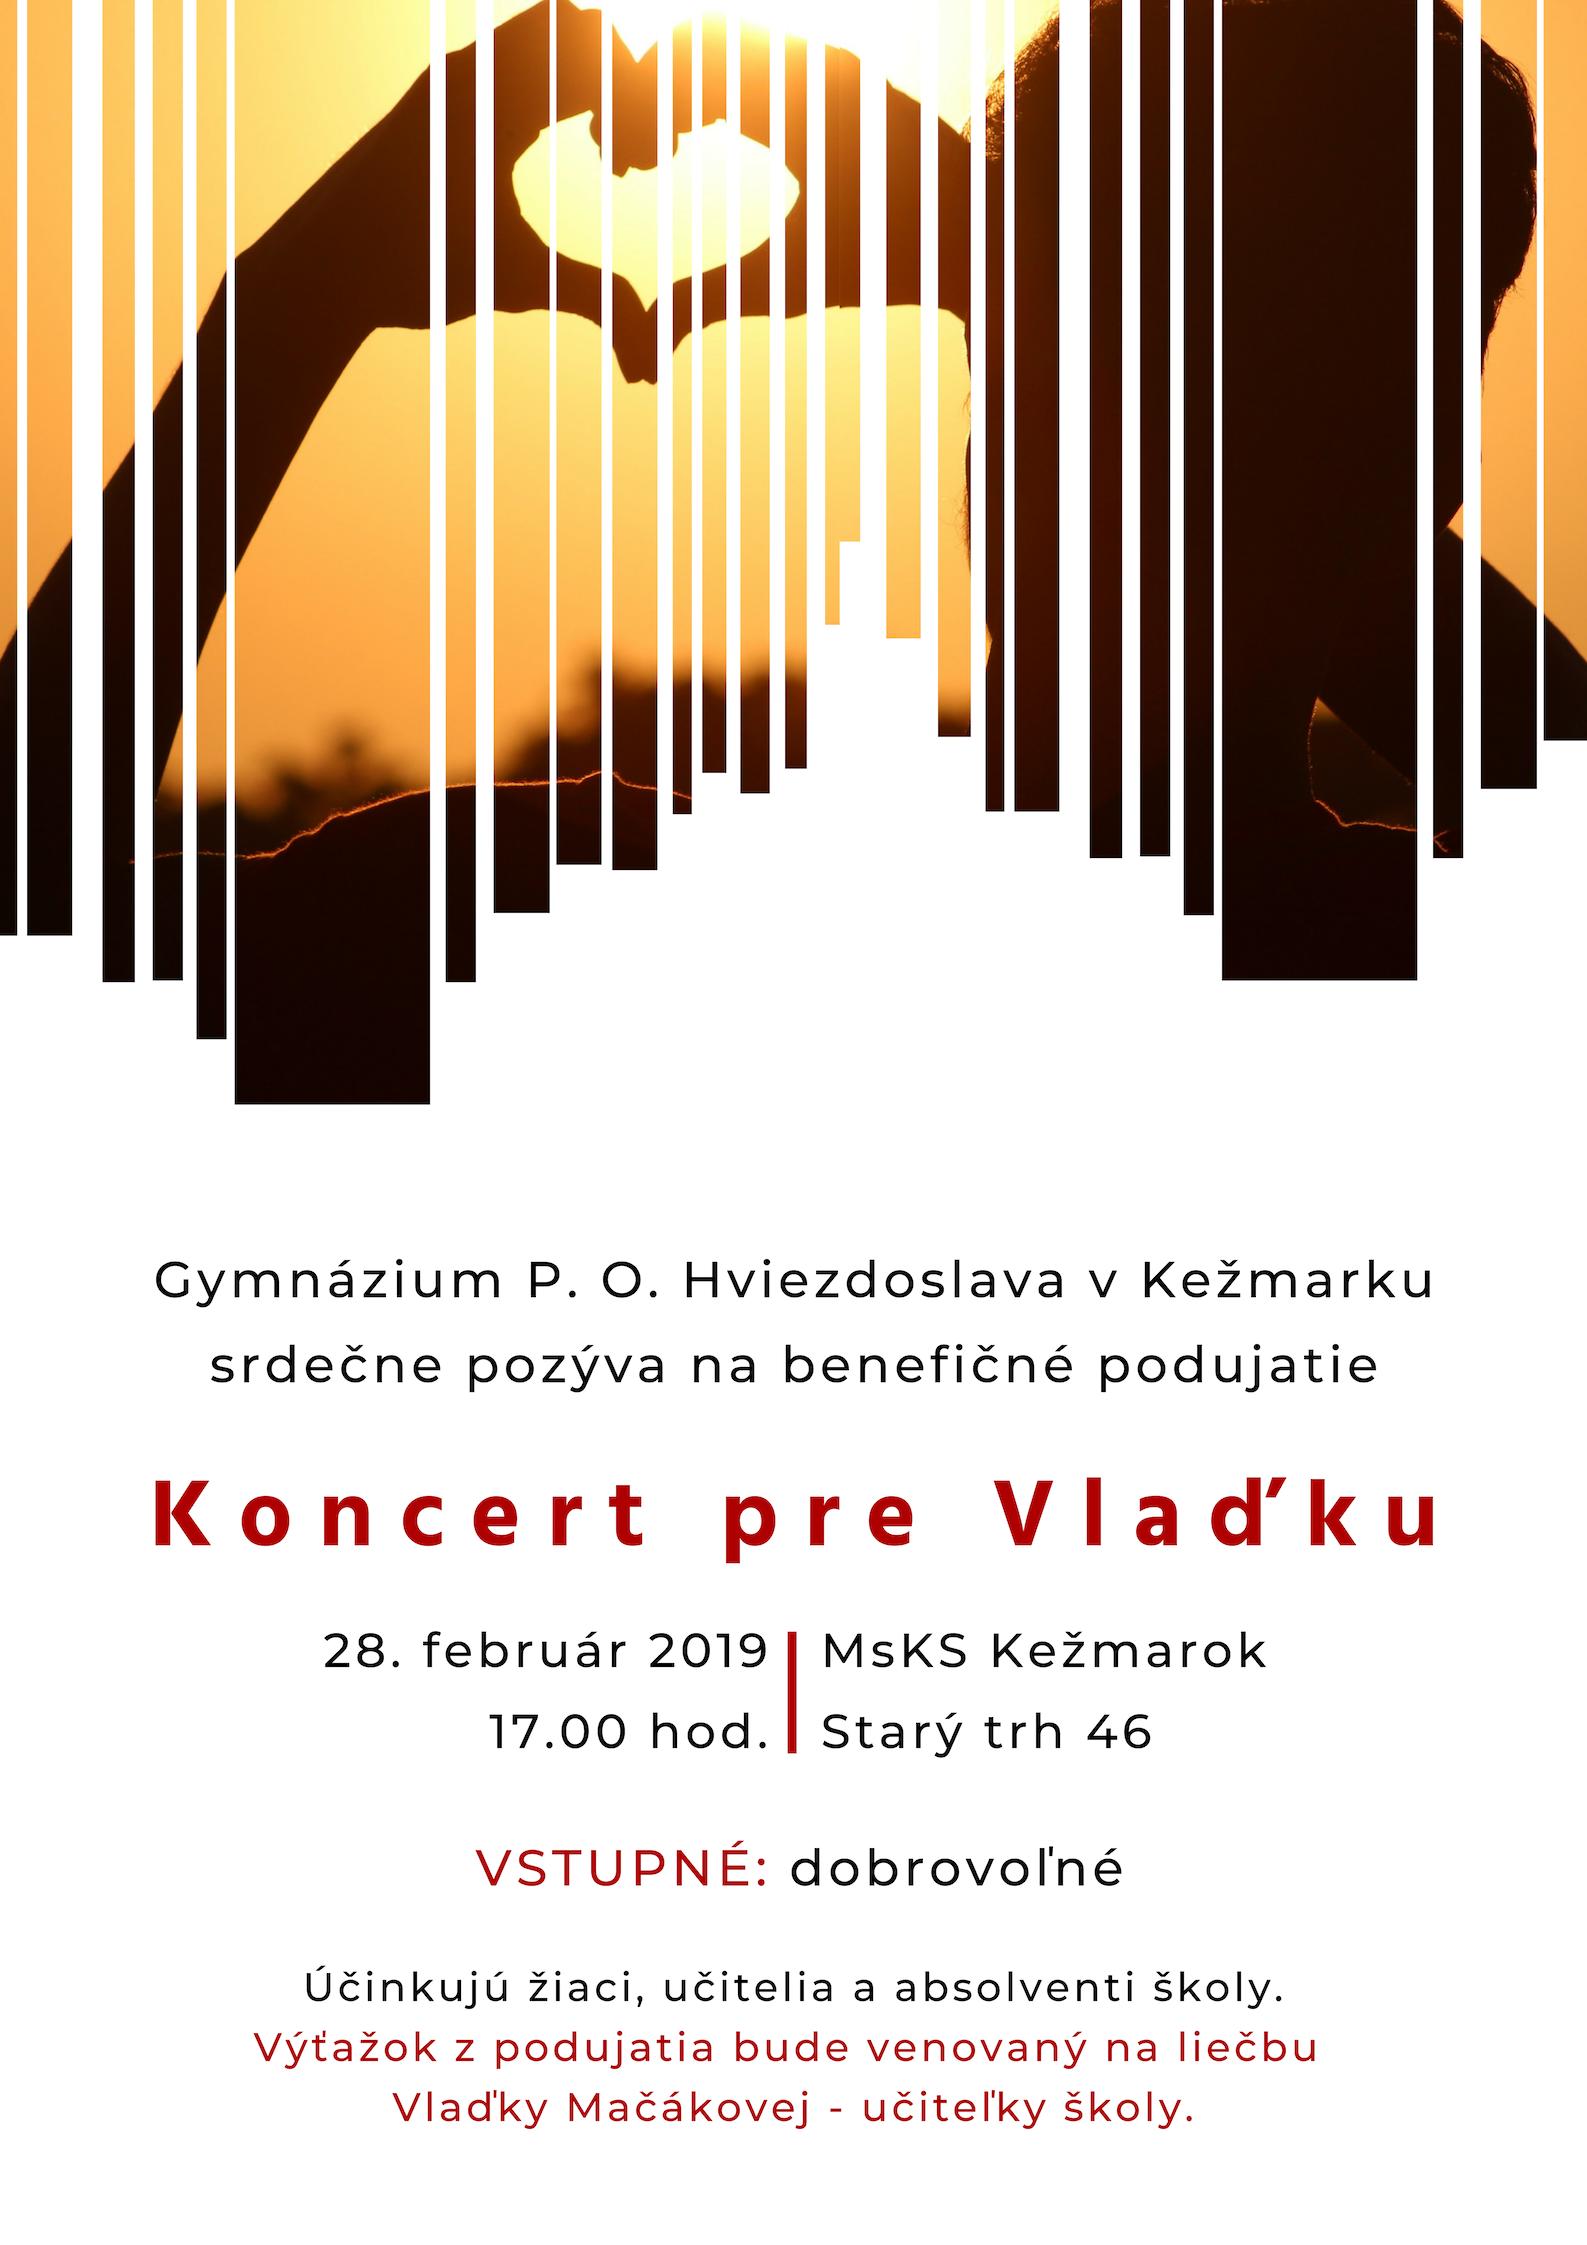 Koncert pre Vlaďku